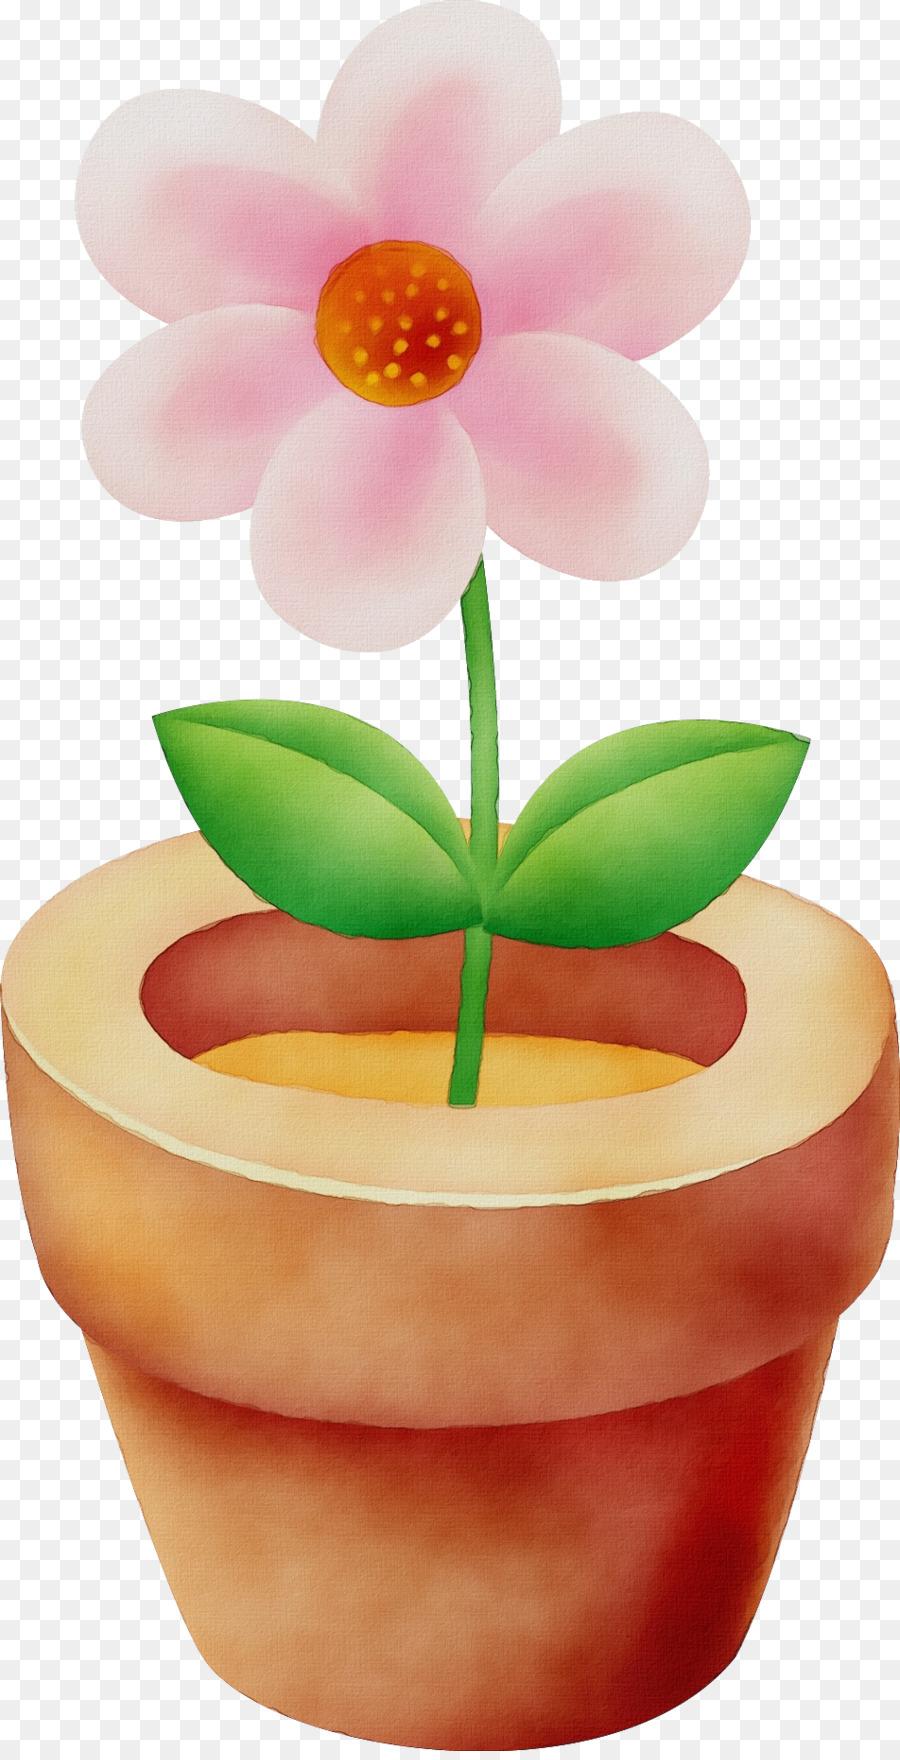 Pot Bunga Bunga Buku Mewarnai Gambar Png